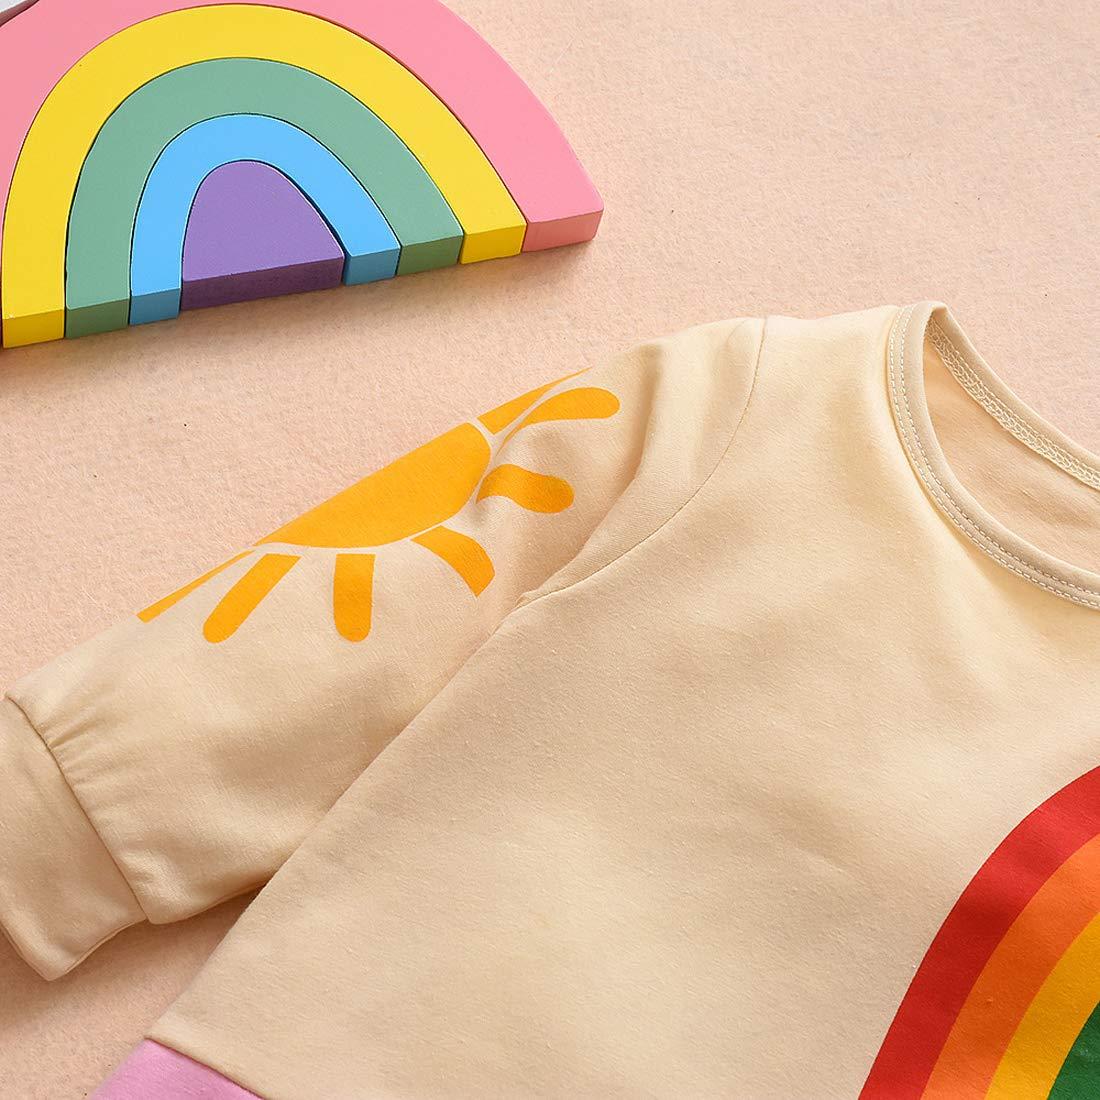 Color Liso Color Arco Iris Traje de Manga Larga para beb/é reci/én Nacido de la Marca Ucrania.